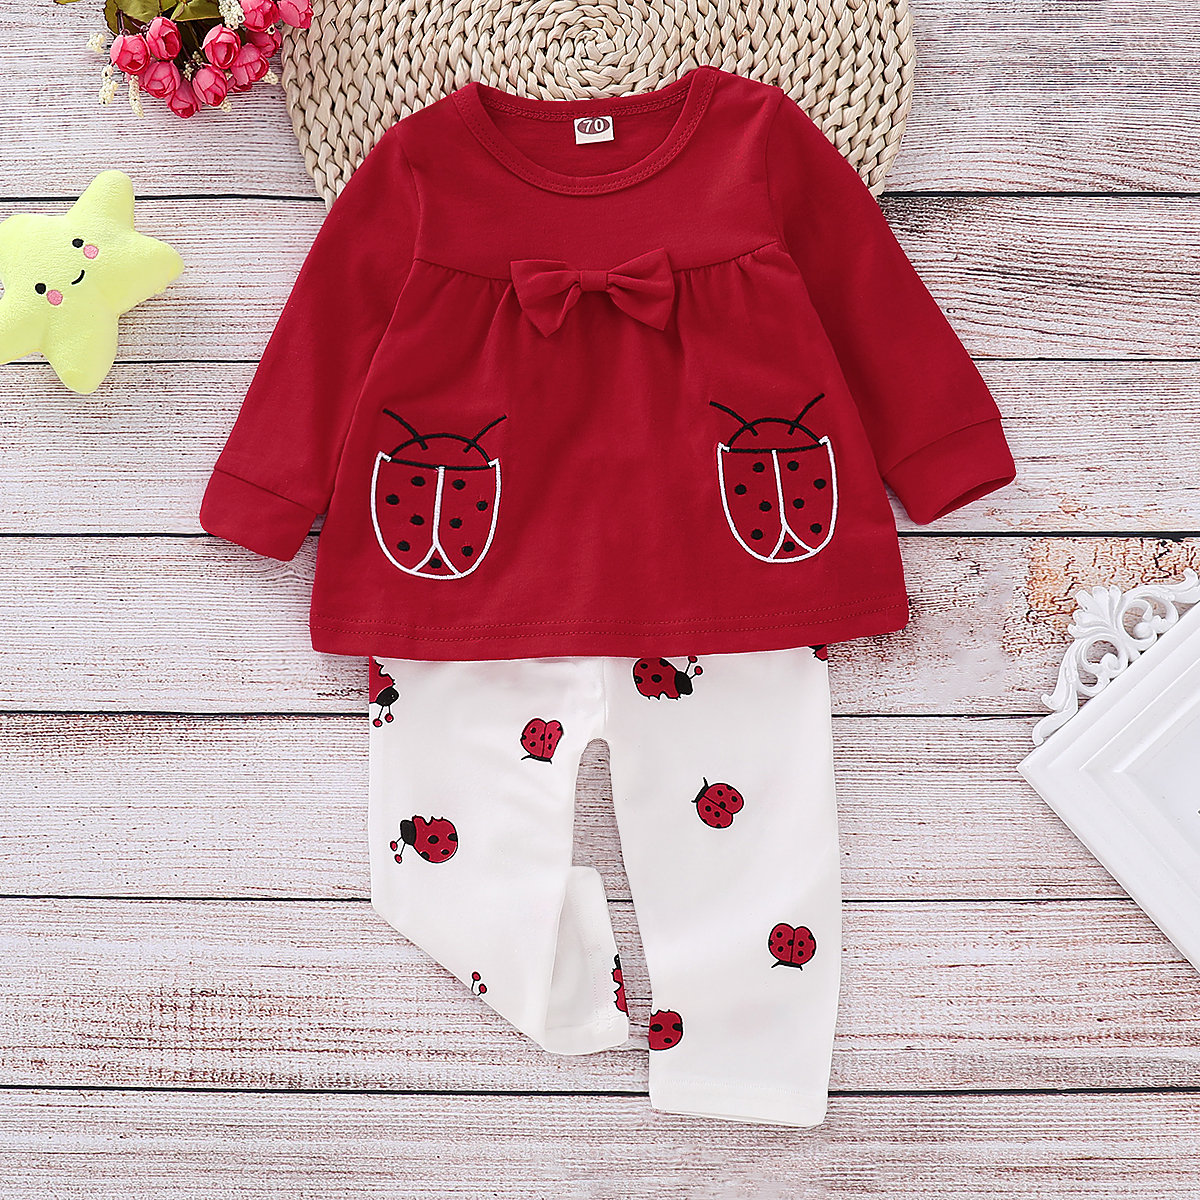 2Pcs Animal Print Baby Girls Tops + Pants Set For 0-24M